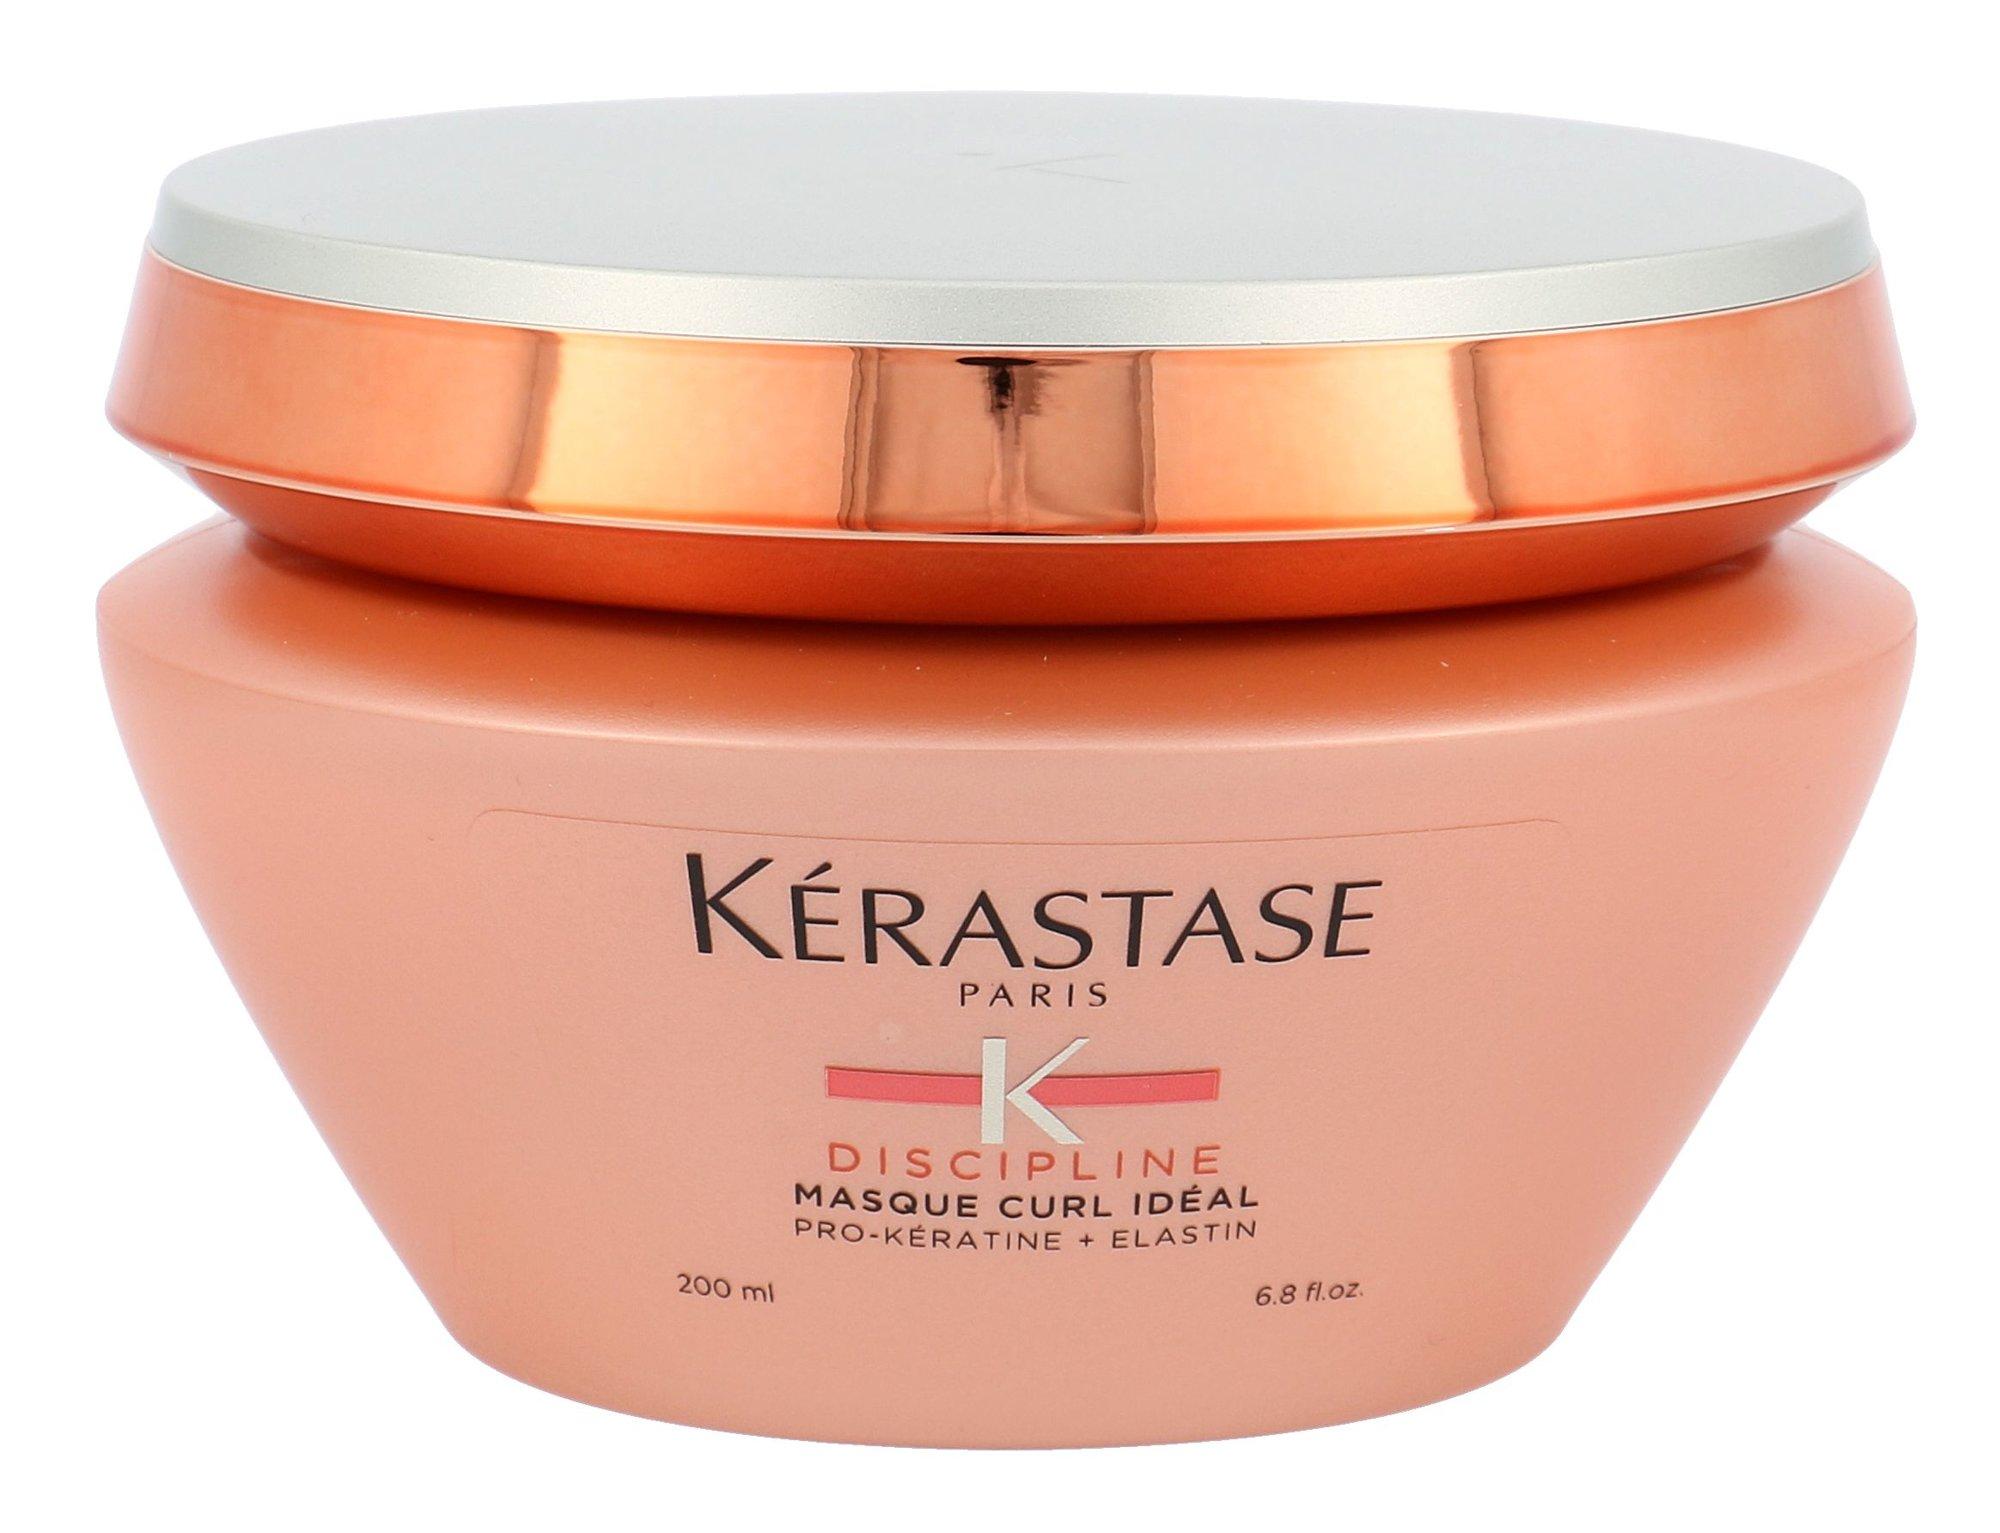 Kérastase Discipline Hair Mask 200ml